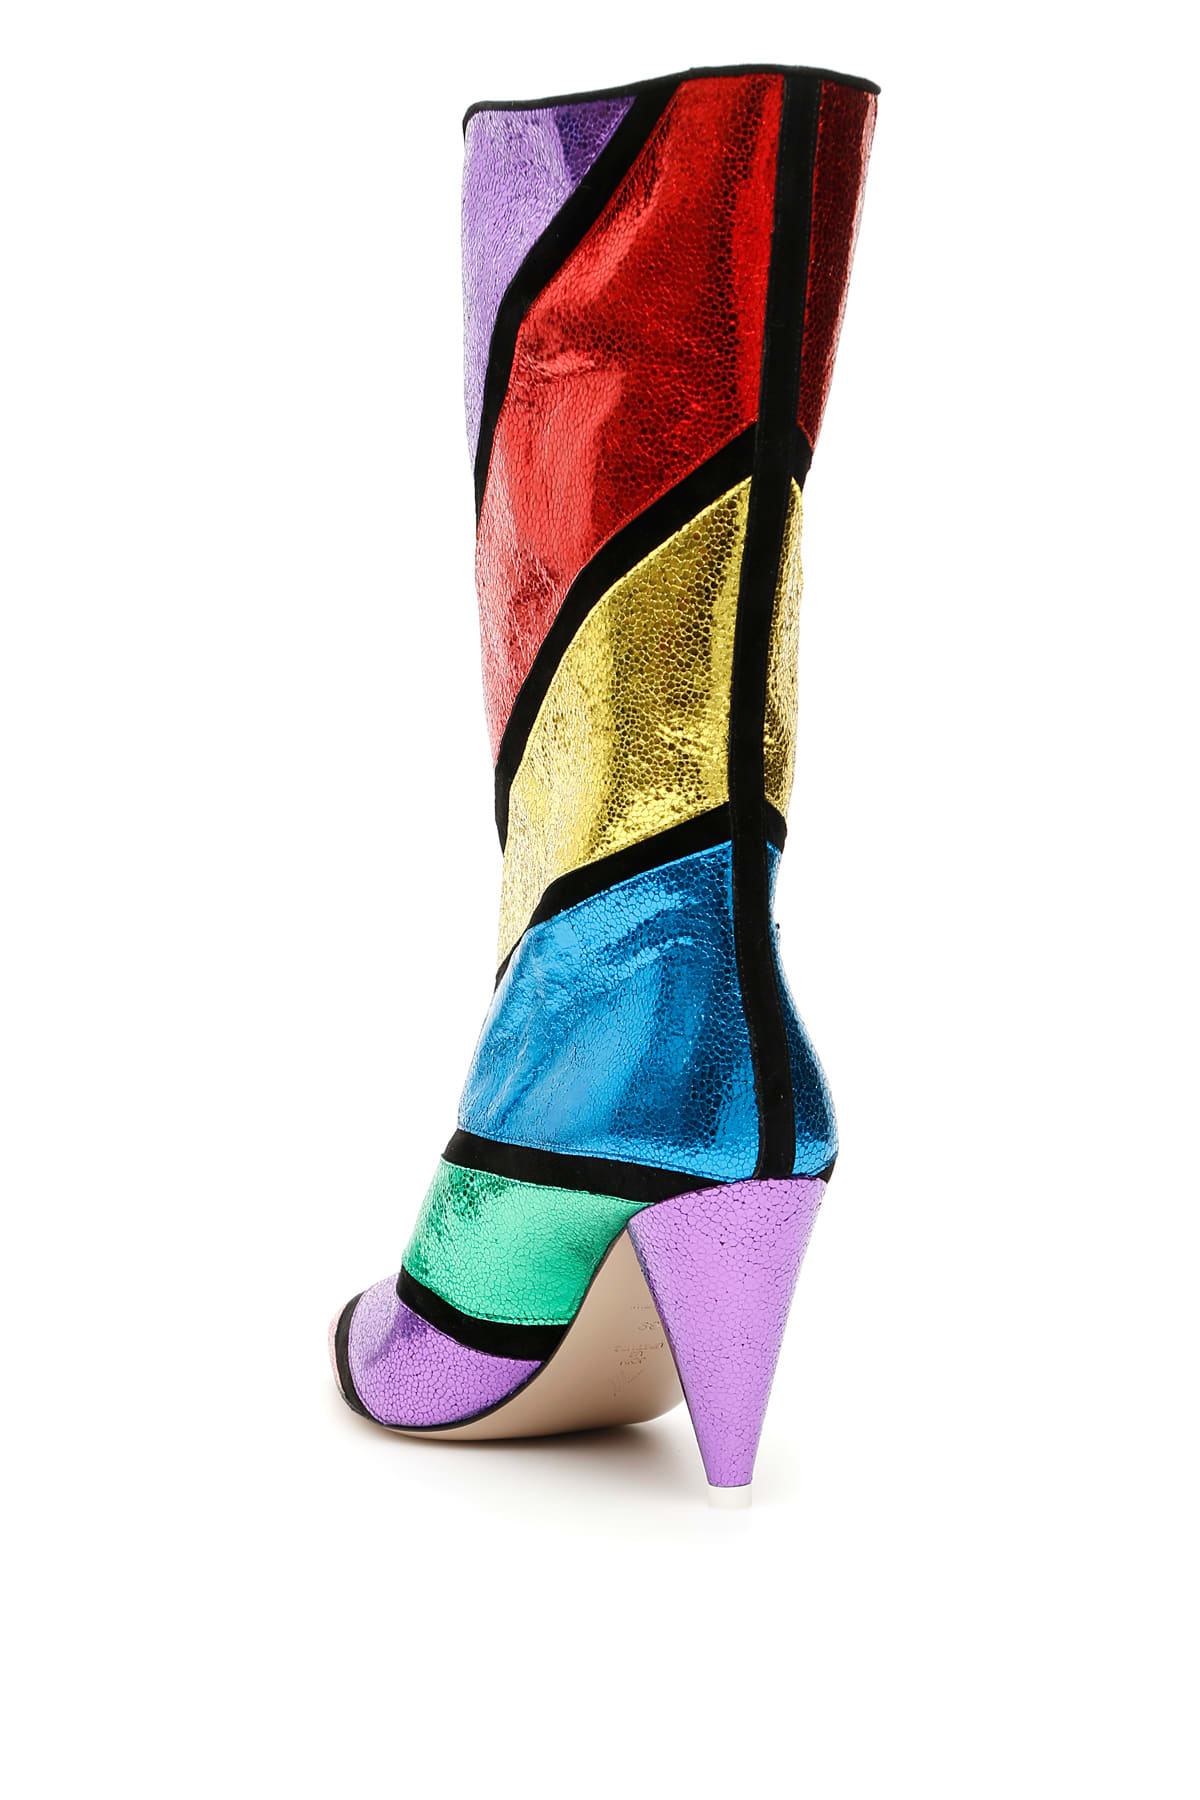 Particular The Attico Lame' Nappa Betta Boots - Great Deals